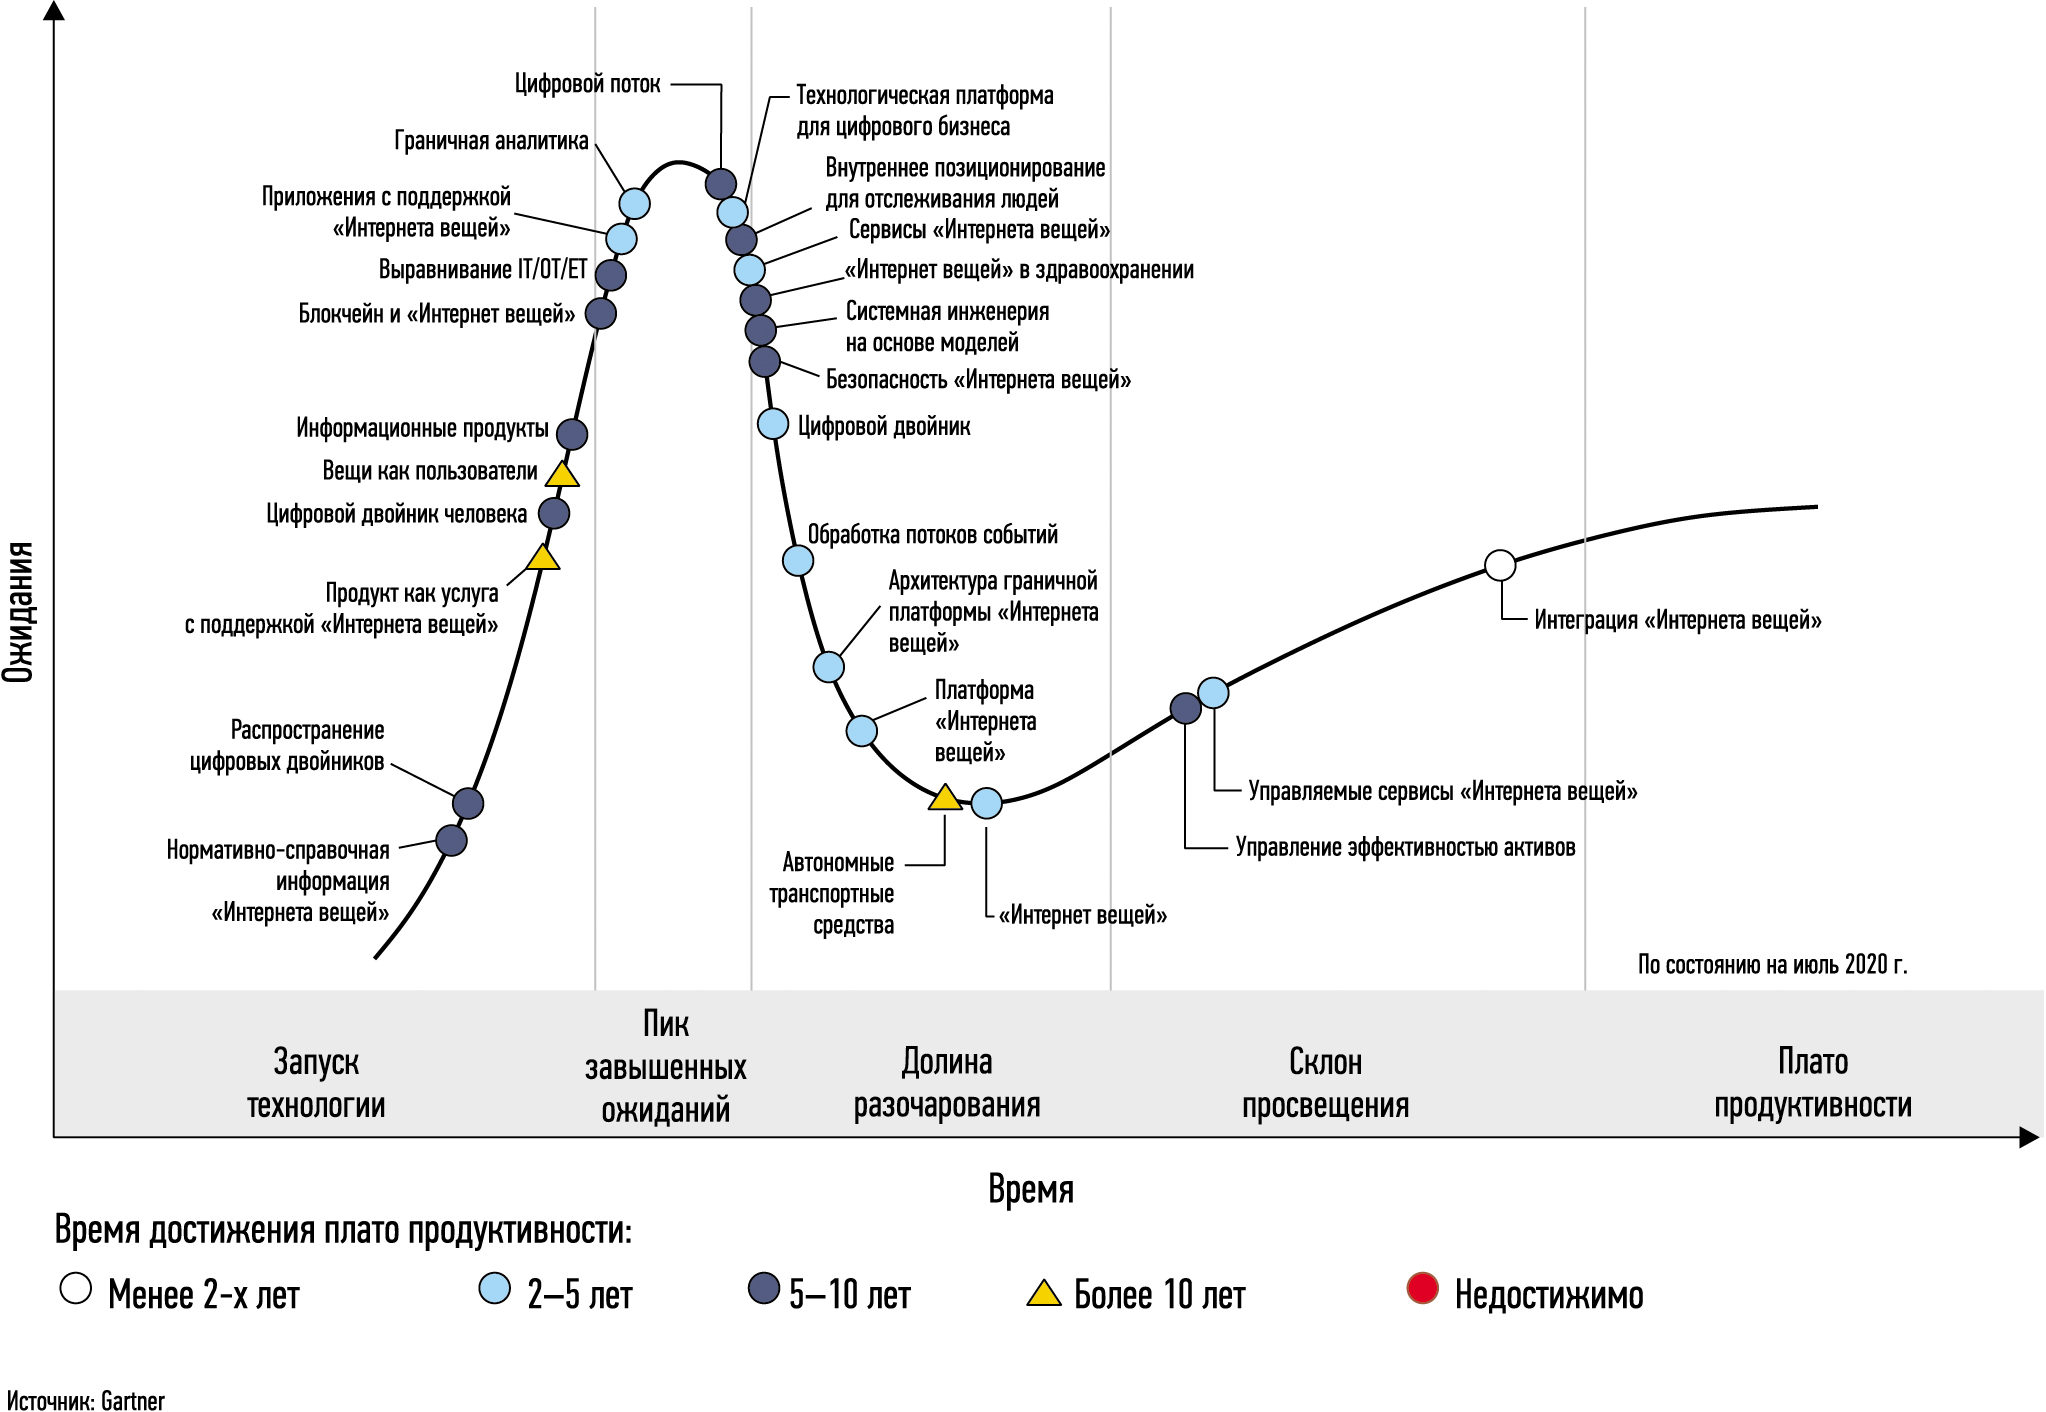 Аналитика Gartner: кривая ажиотажа для «Интернета вещей»